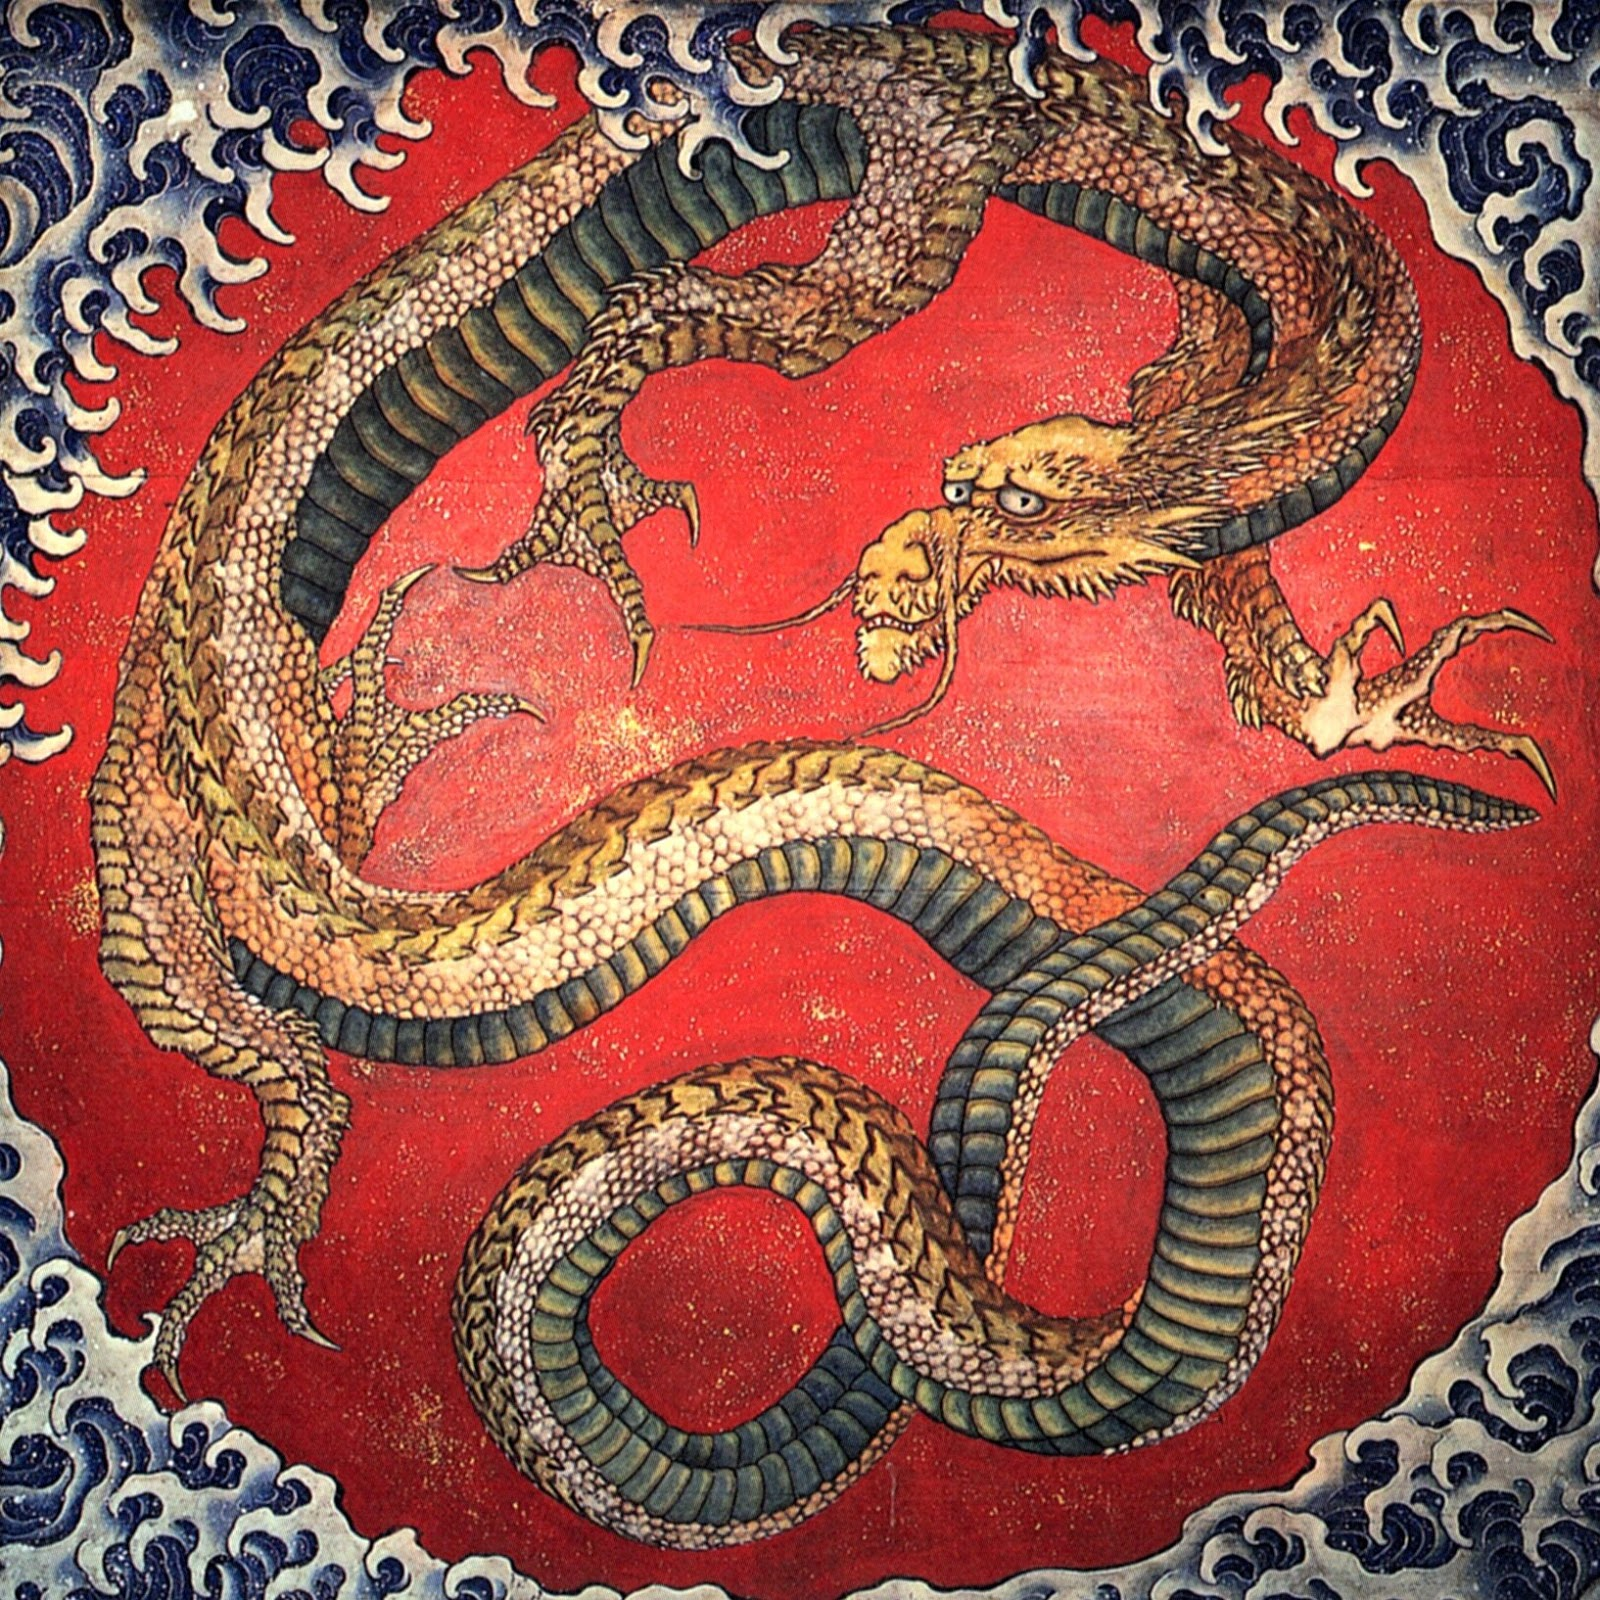 Korean Dragon: Tattoo